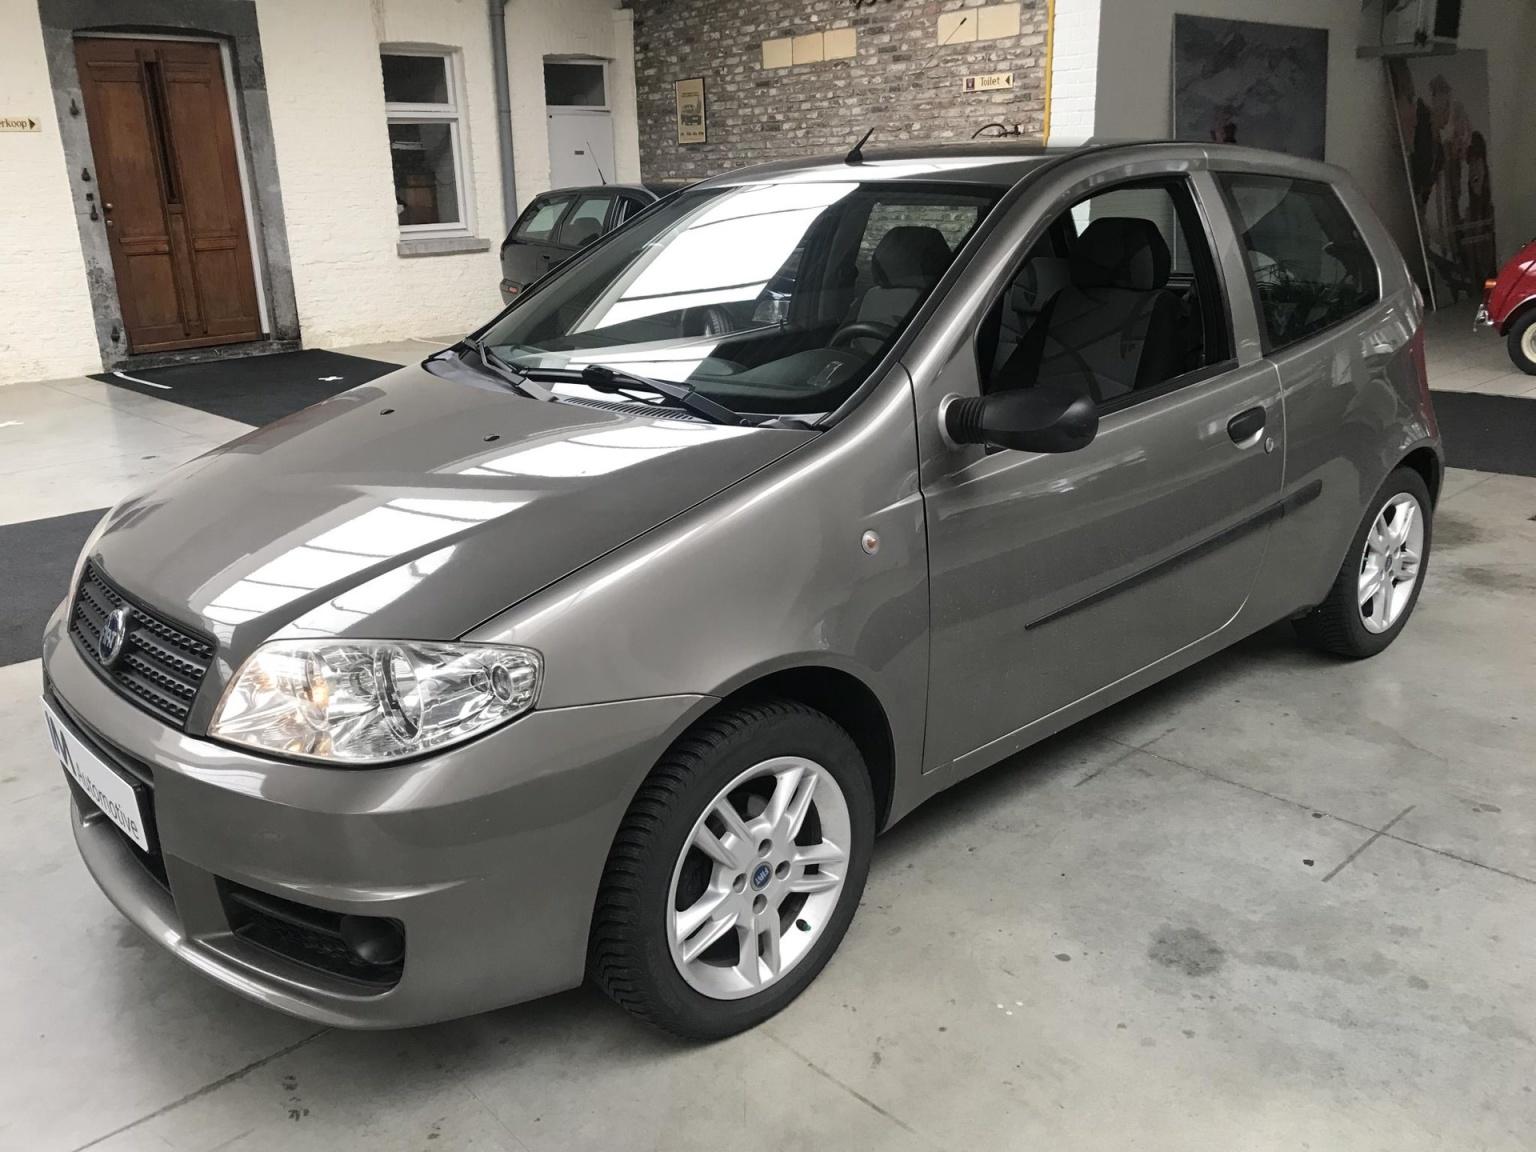 Fiat-Punto-2